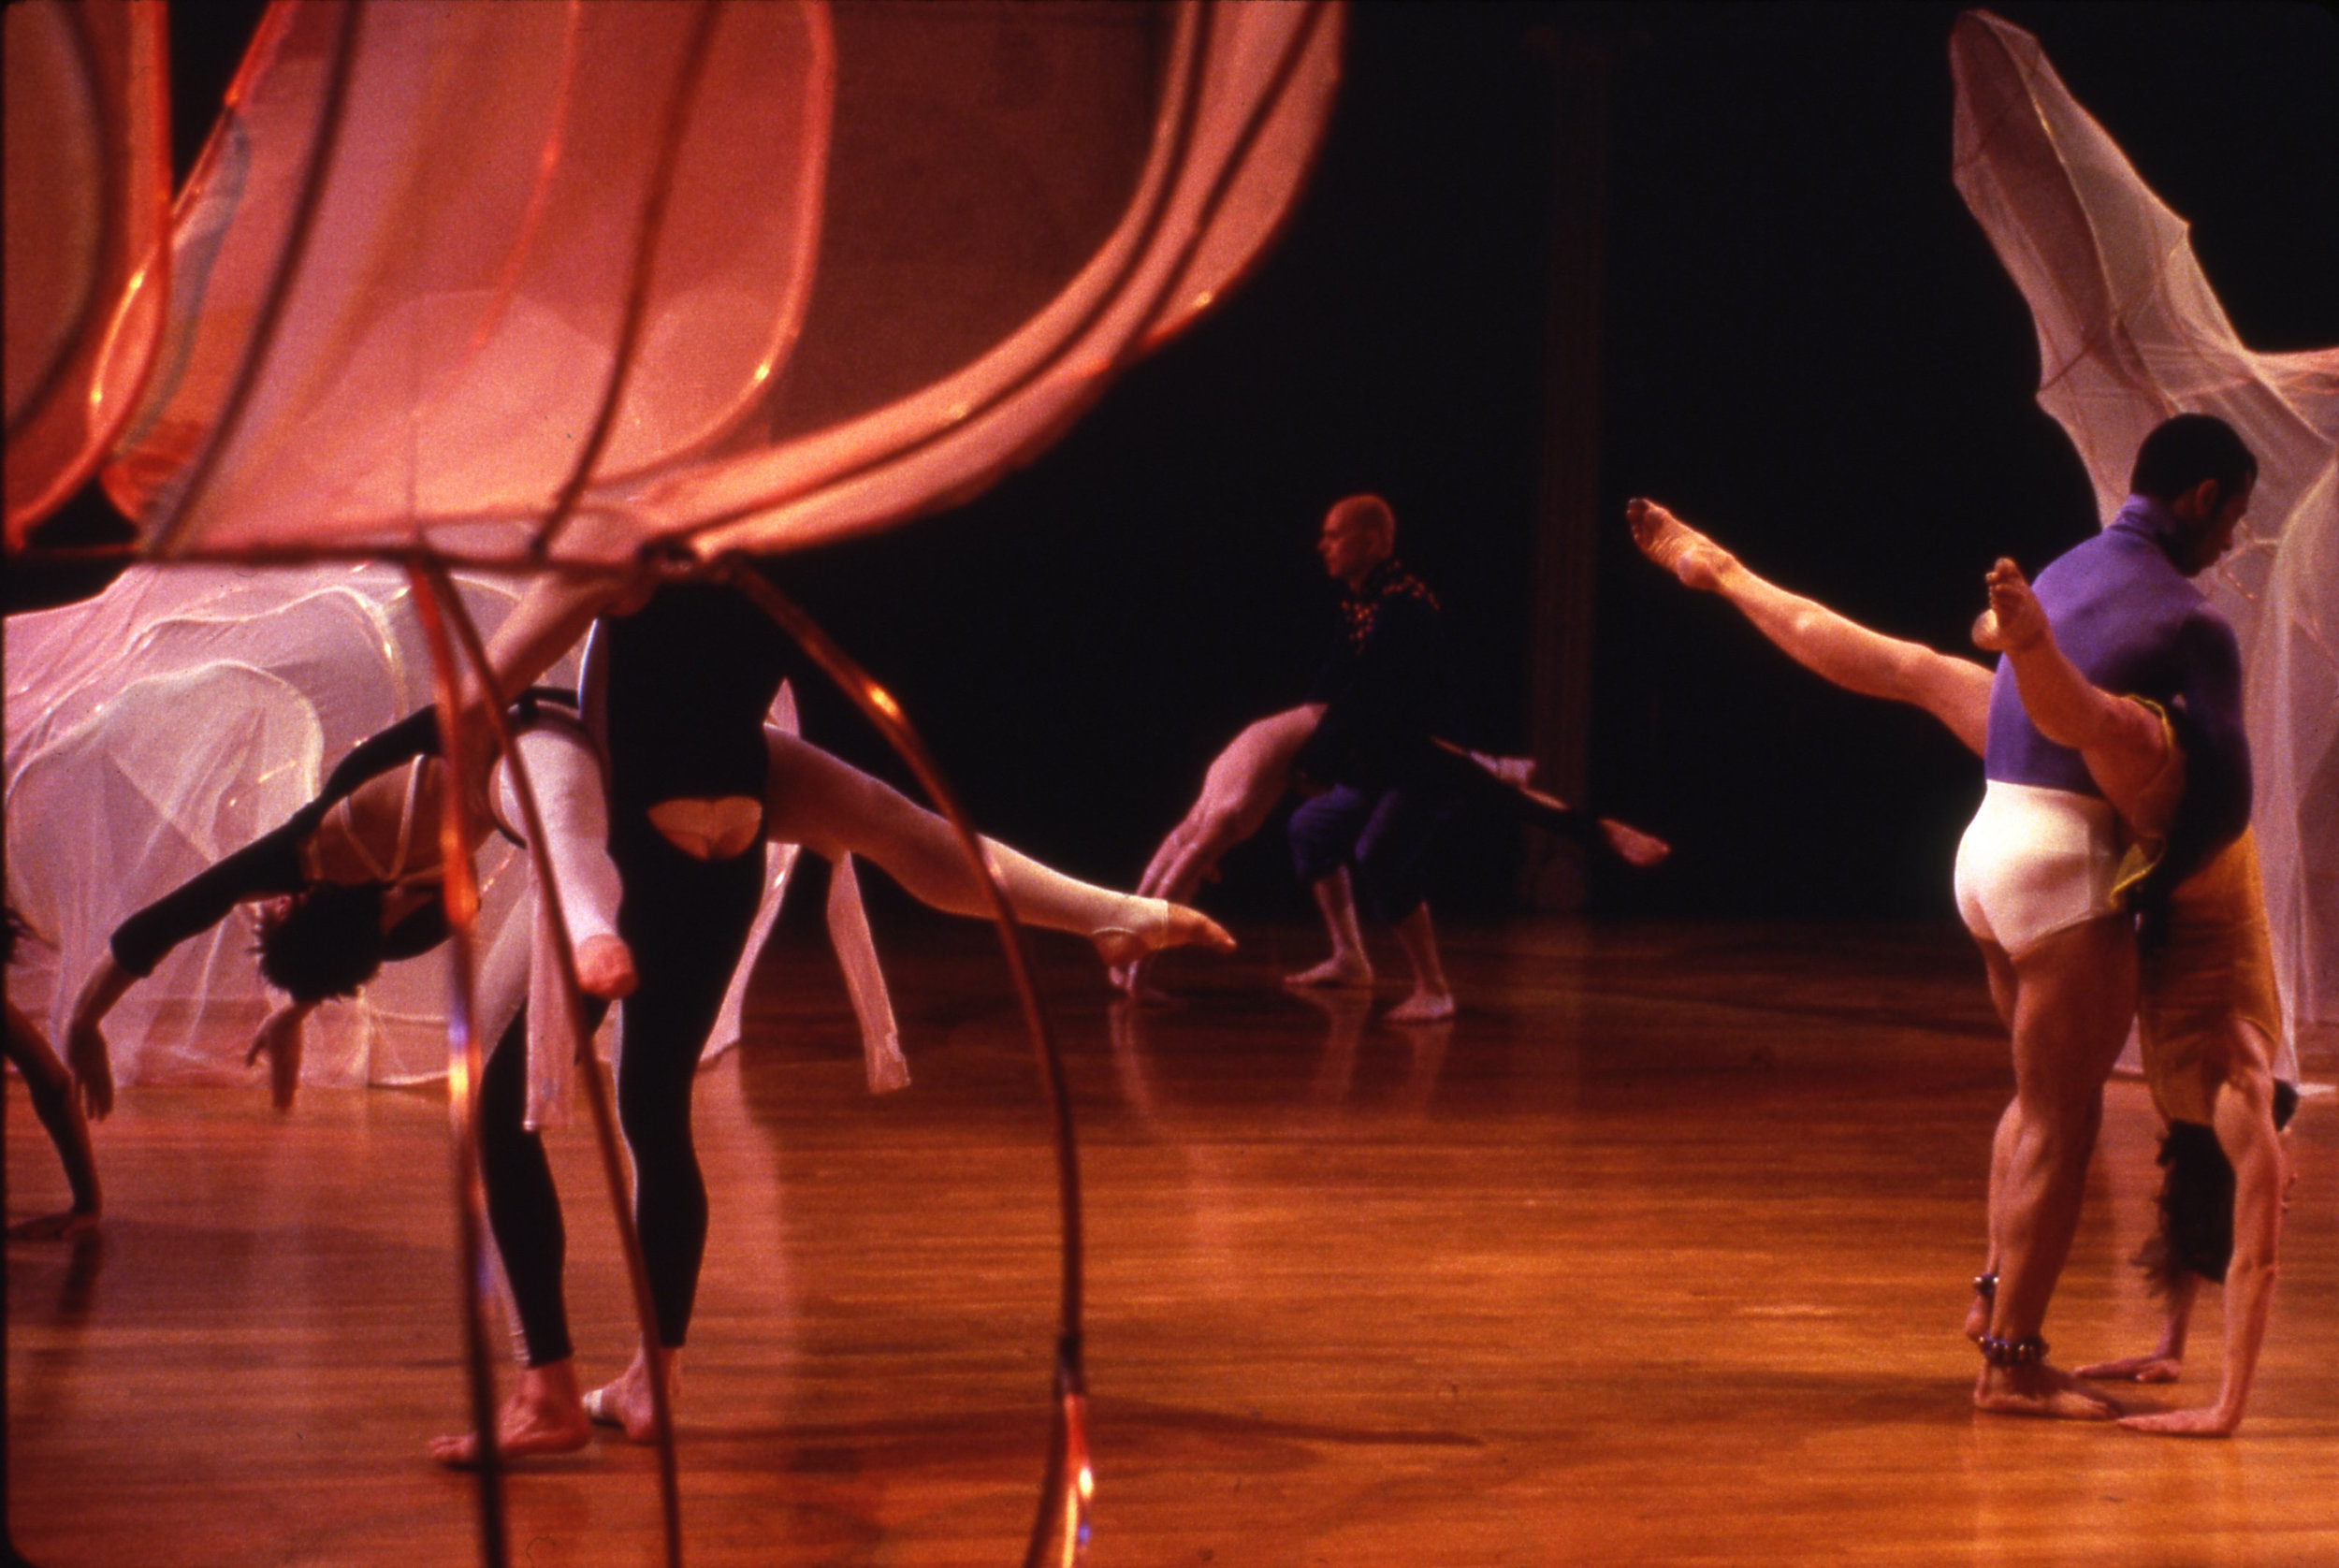 08_MimiGross_Set:CharlesAtlas,Costumes:Douglas Dunn+Dancers_%22CoccaMocca%22_1998_4of5.jpg